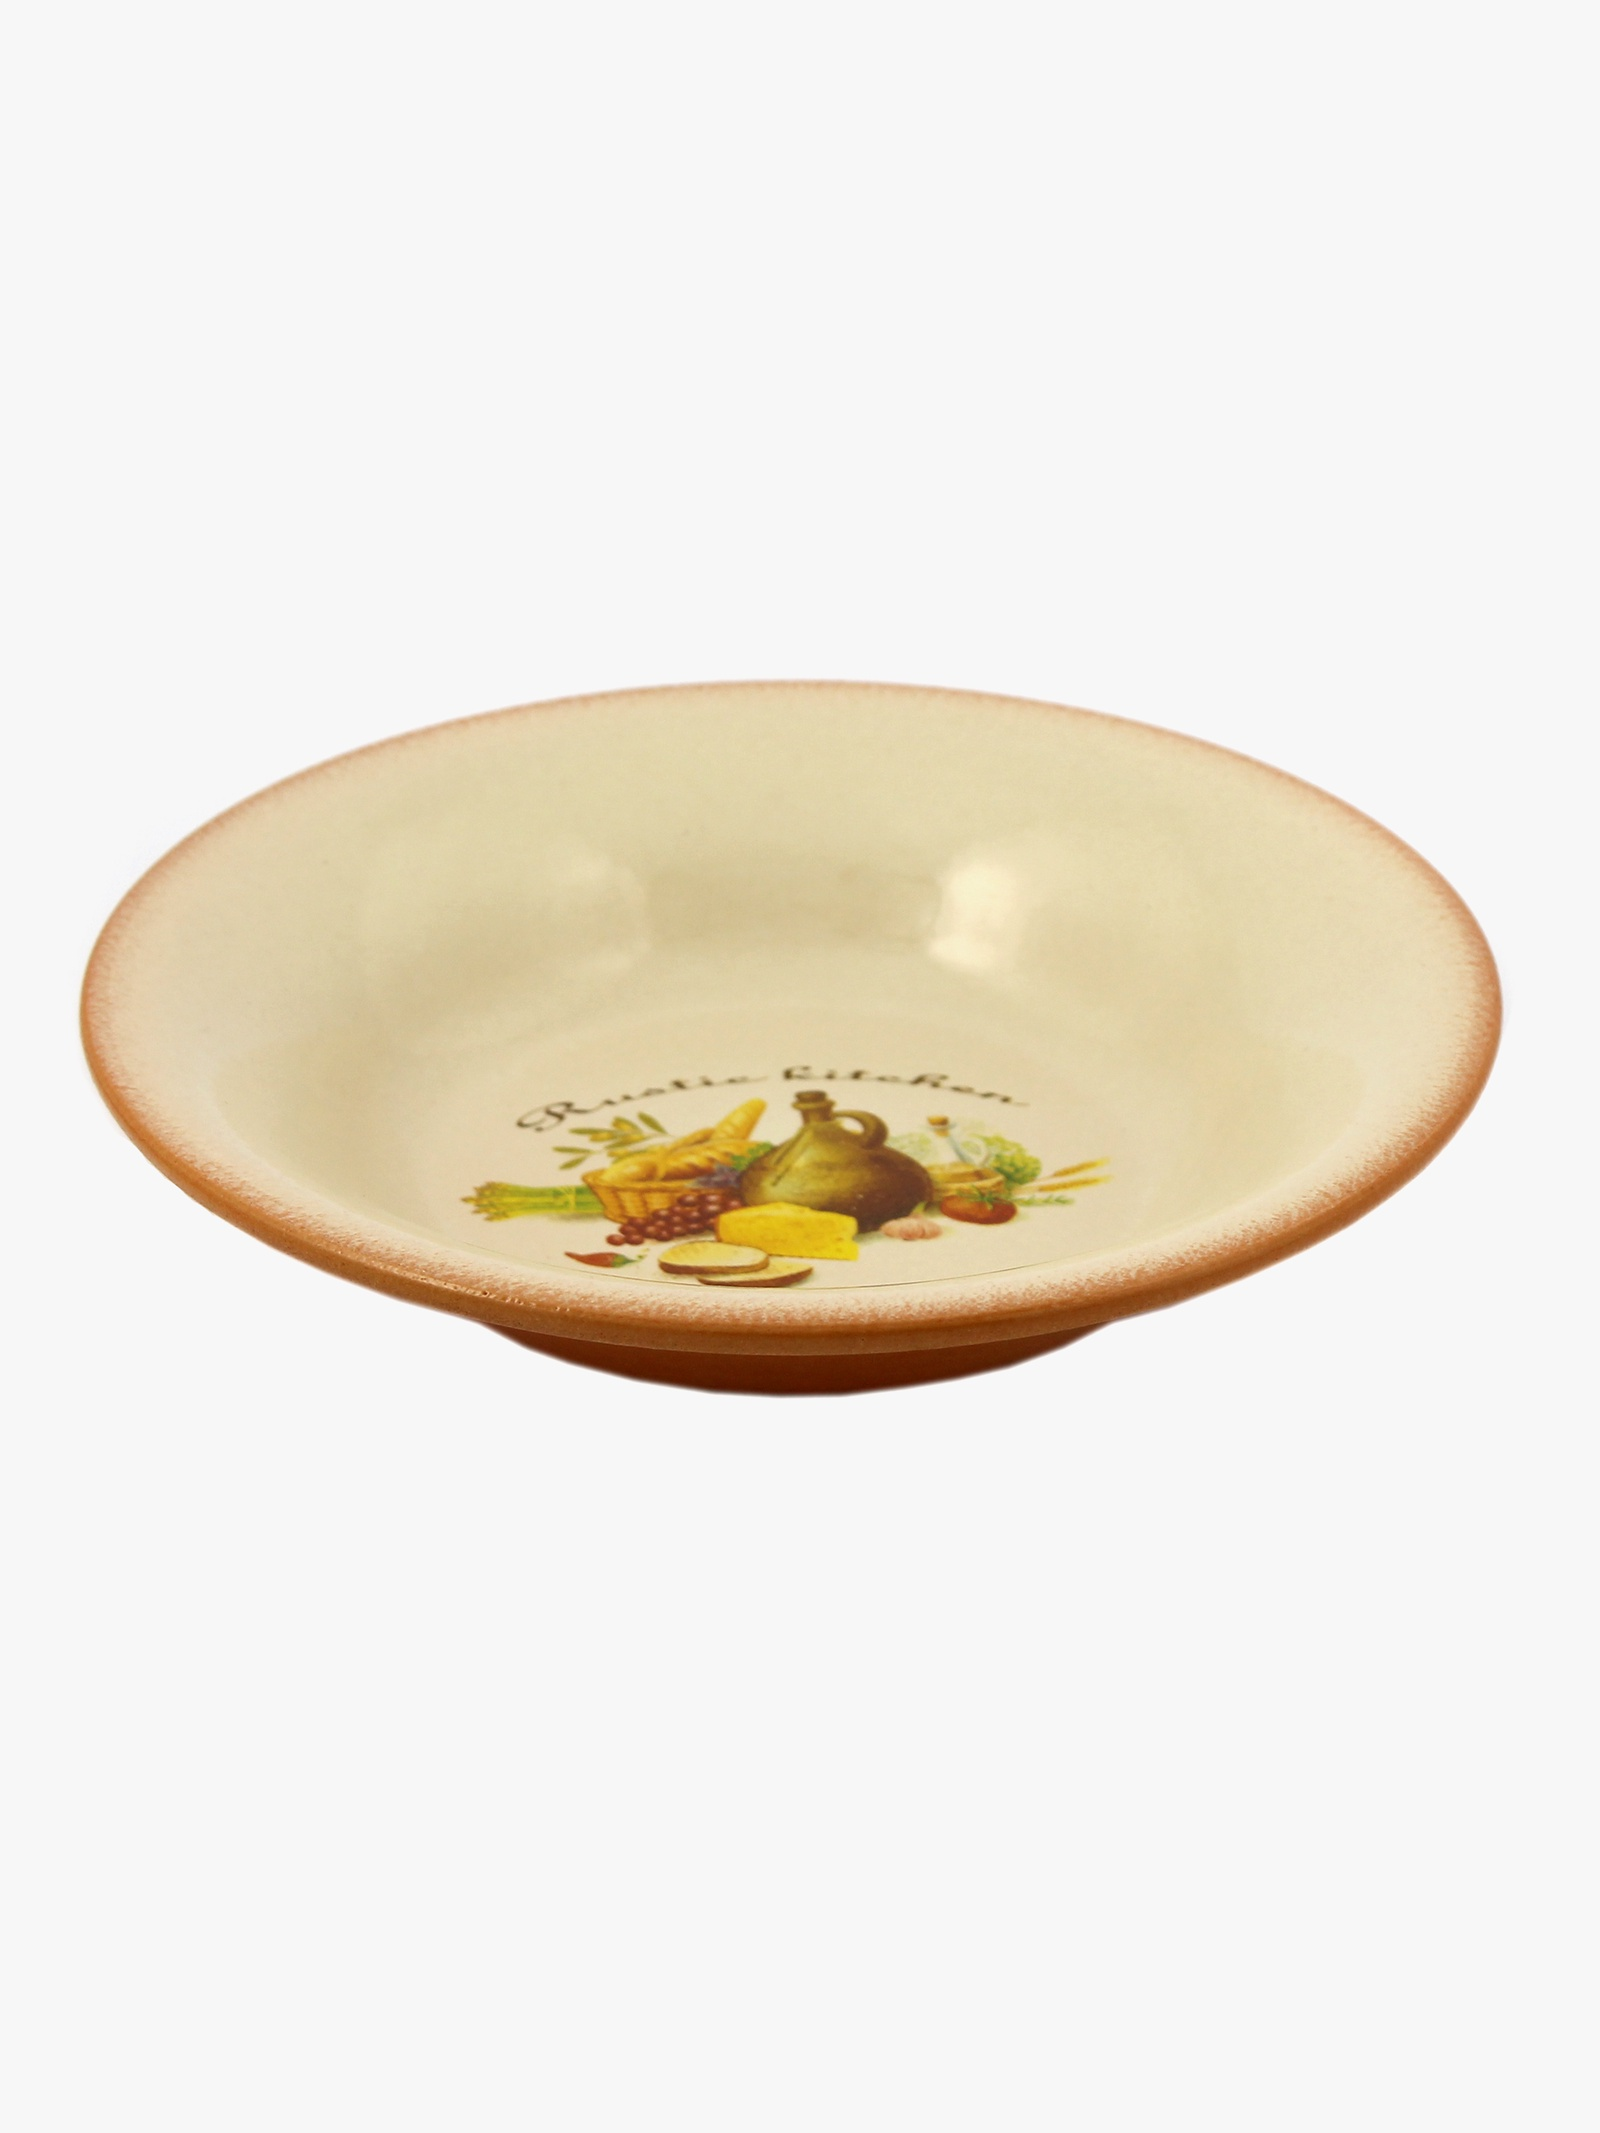 Набор из 4-х глубоких тарелок Rustic Kitchen d22см